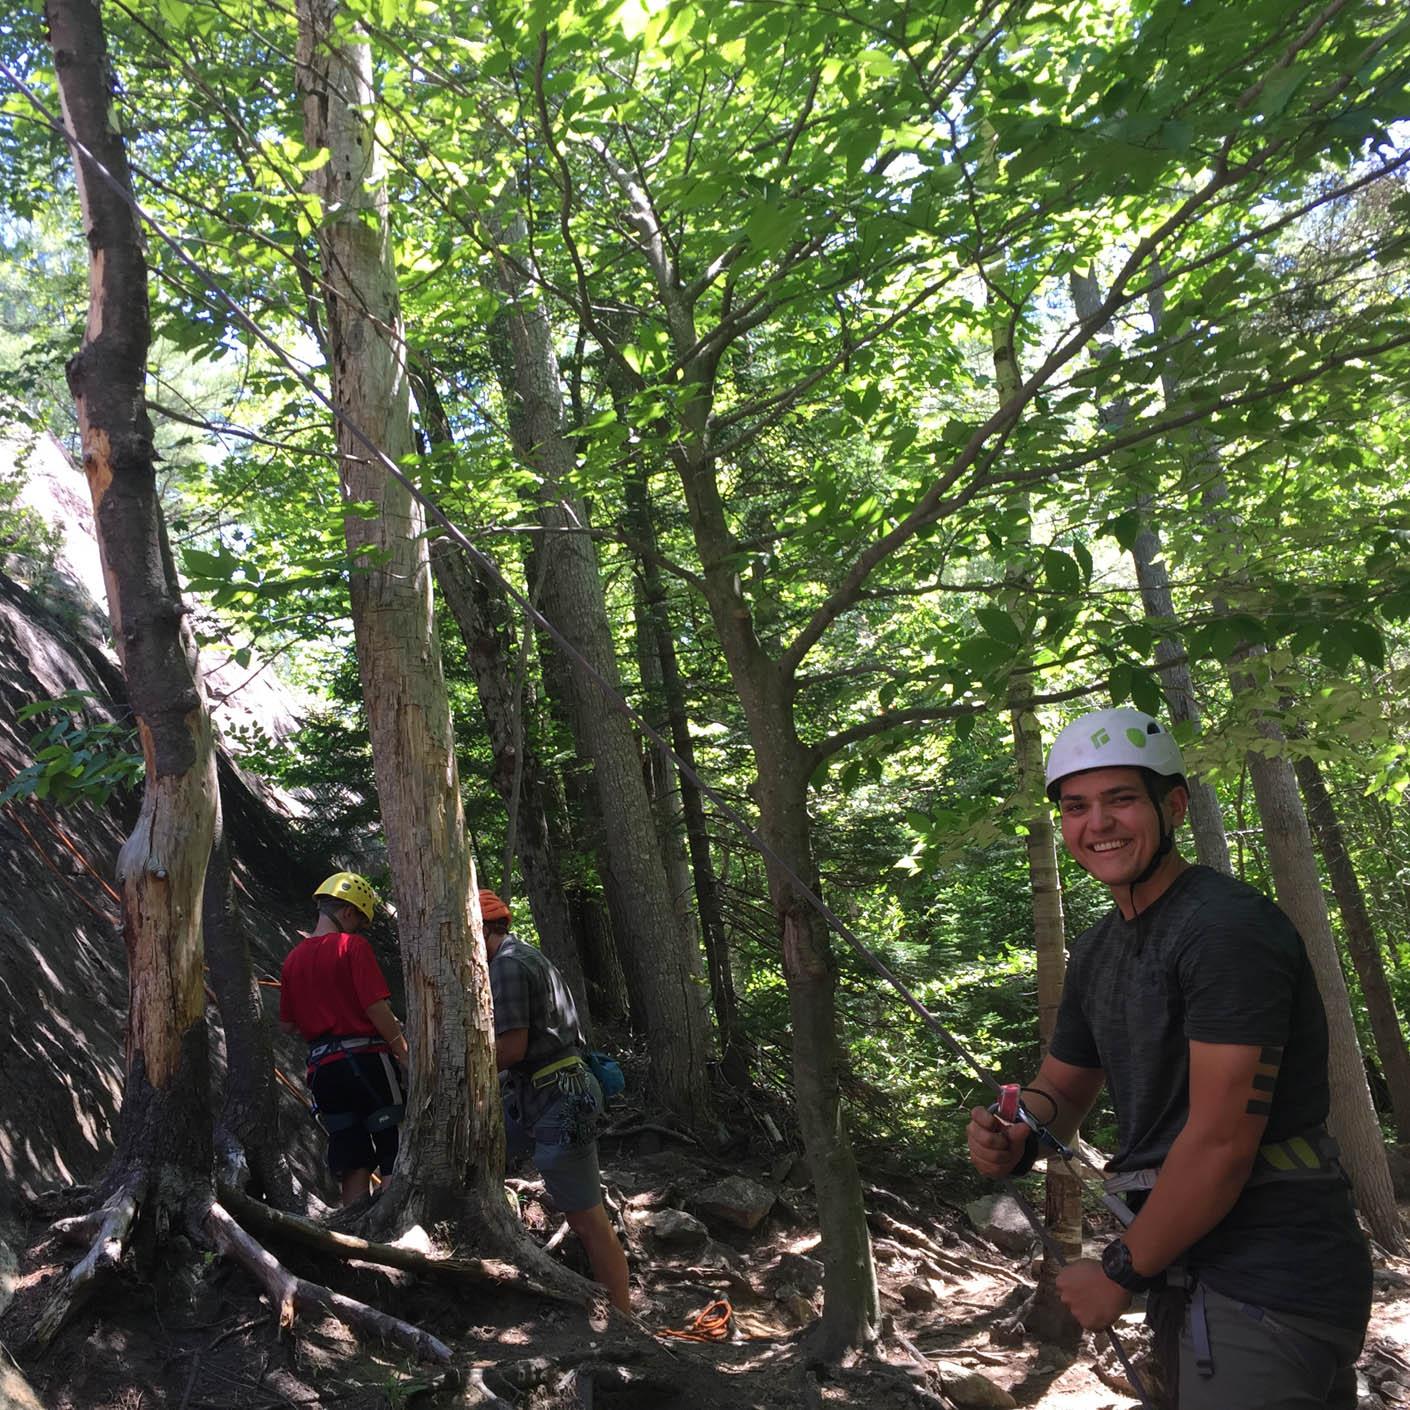 Adirondack Discovery rock climbing